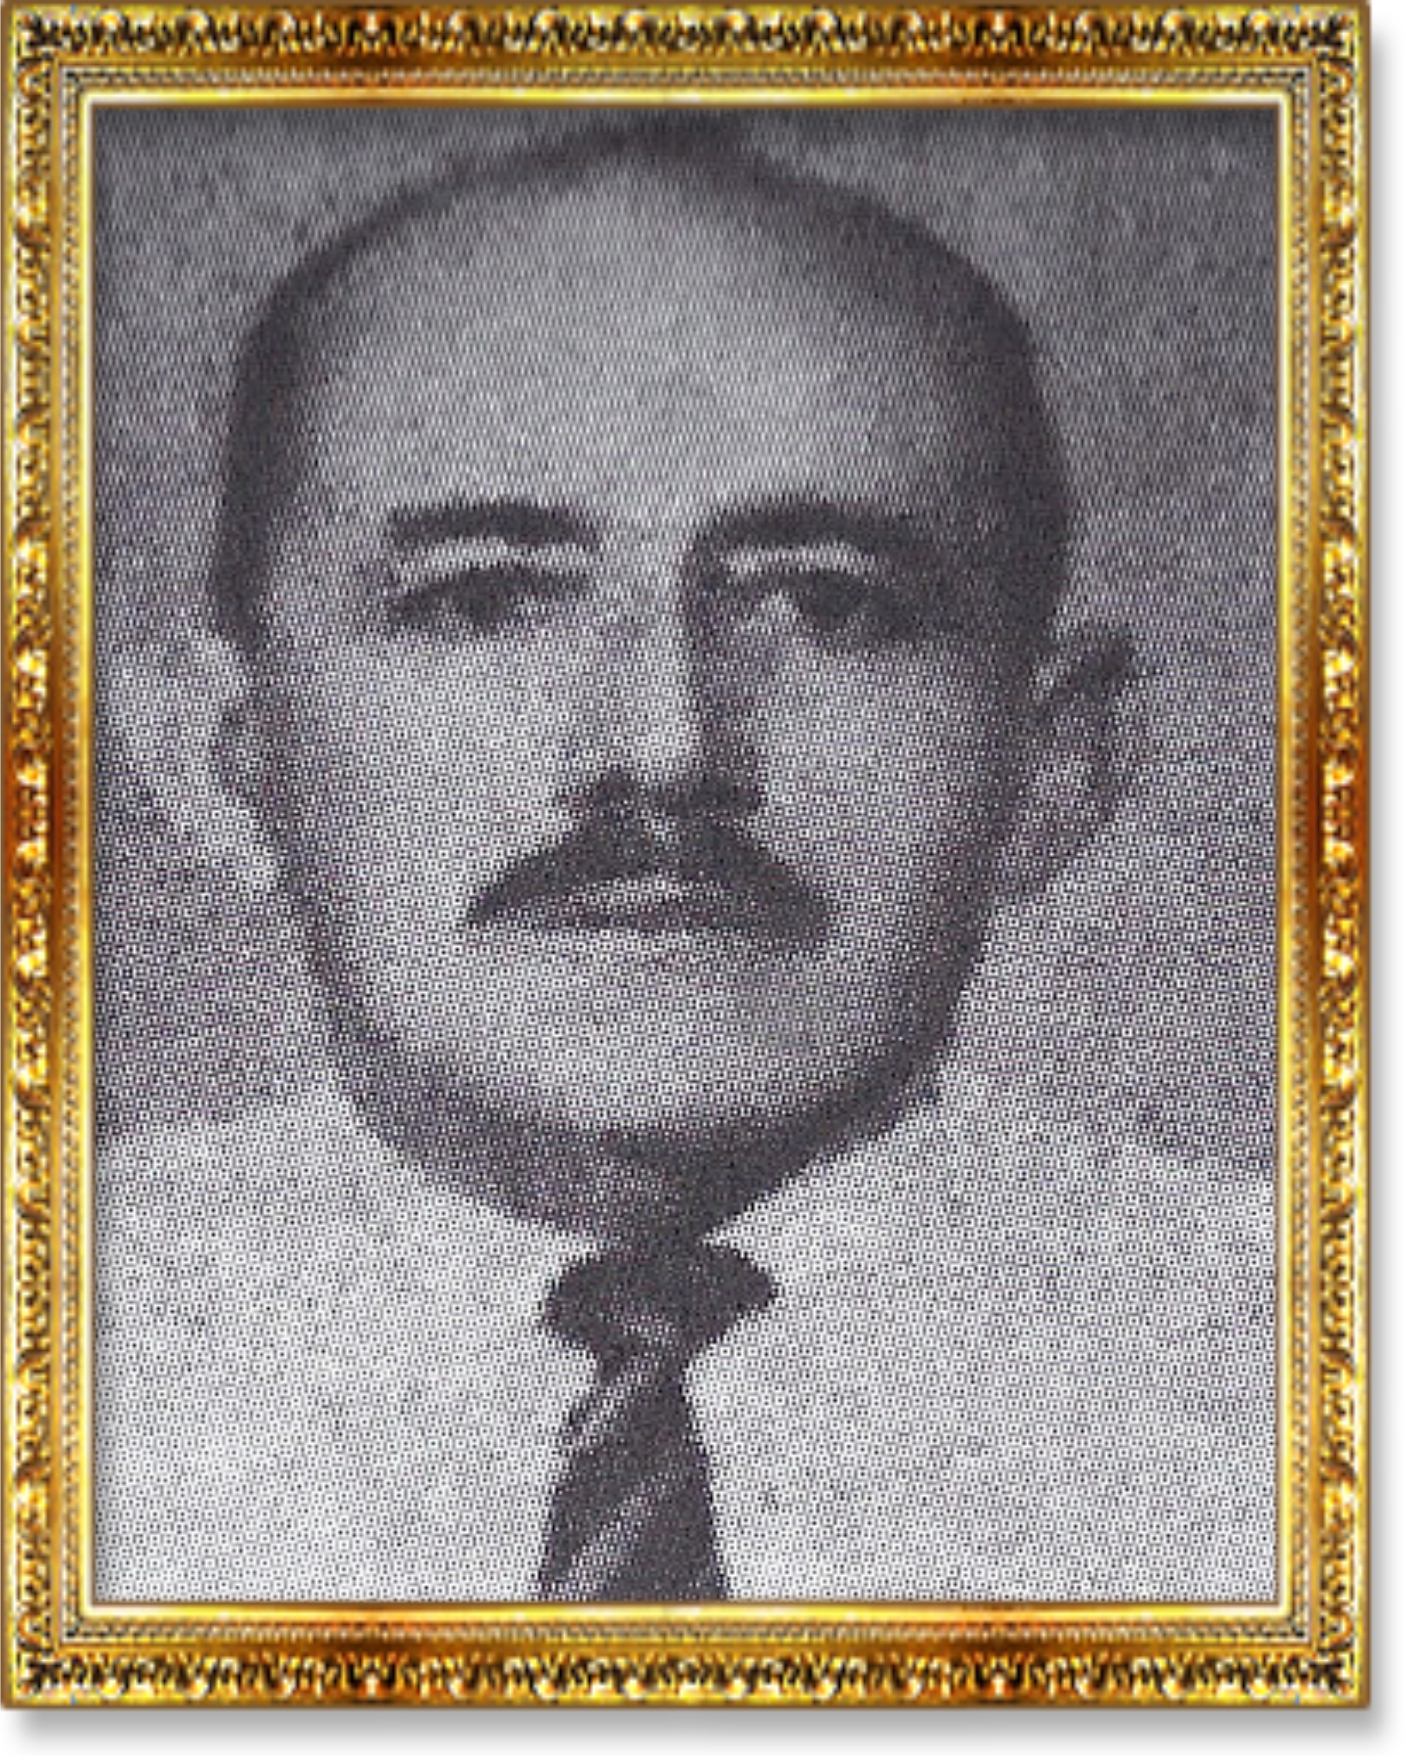 PR. FRANCISCO PURUENSE DE ALENCAR